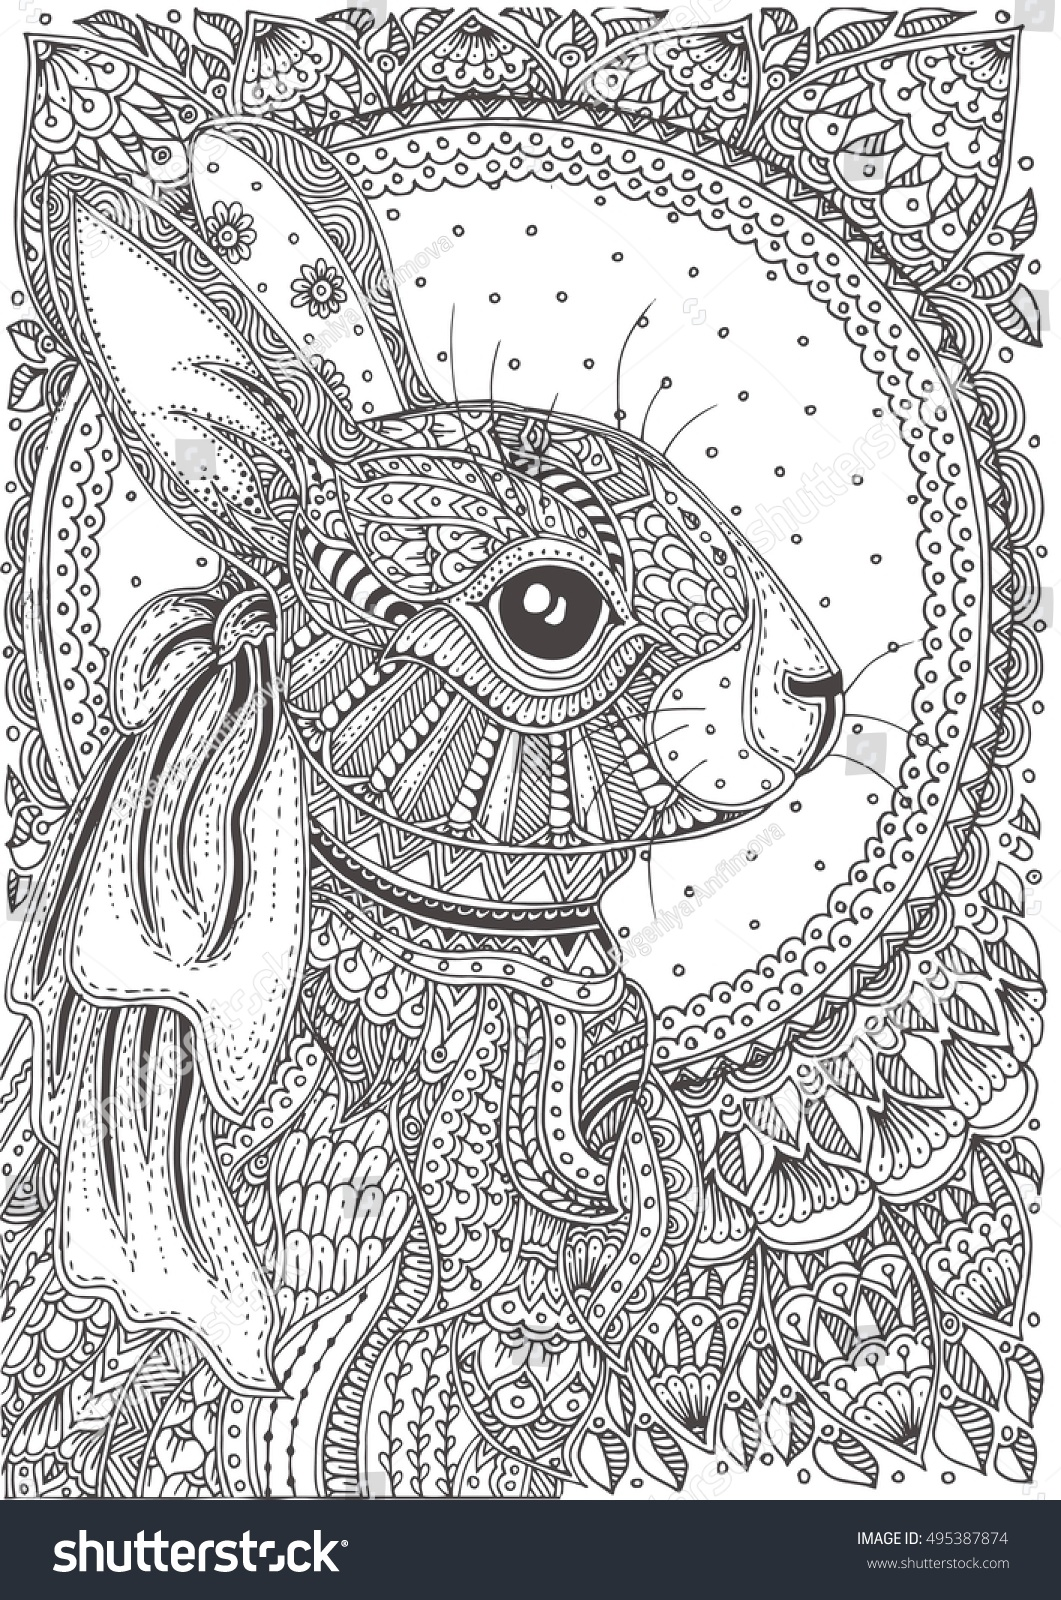 Floral Doodle Pattern Coloring Page Zendala Design For